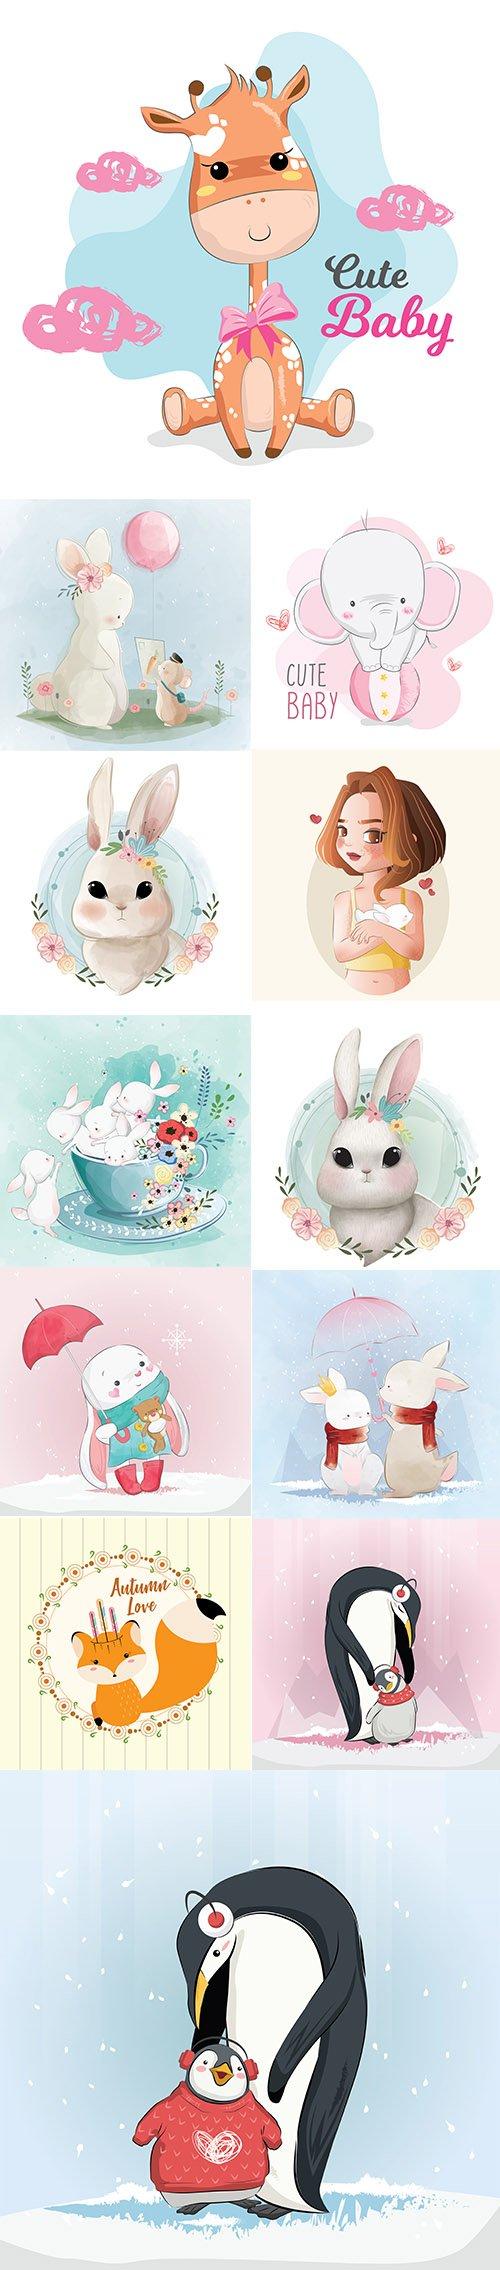 Hand Draw Watercolor Adorable Animals Illustrations Vol 3